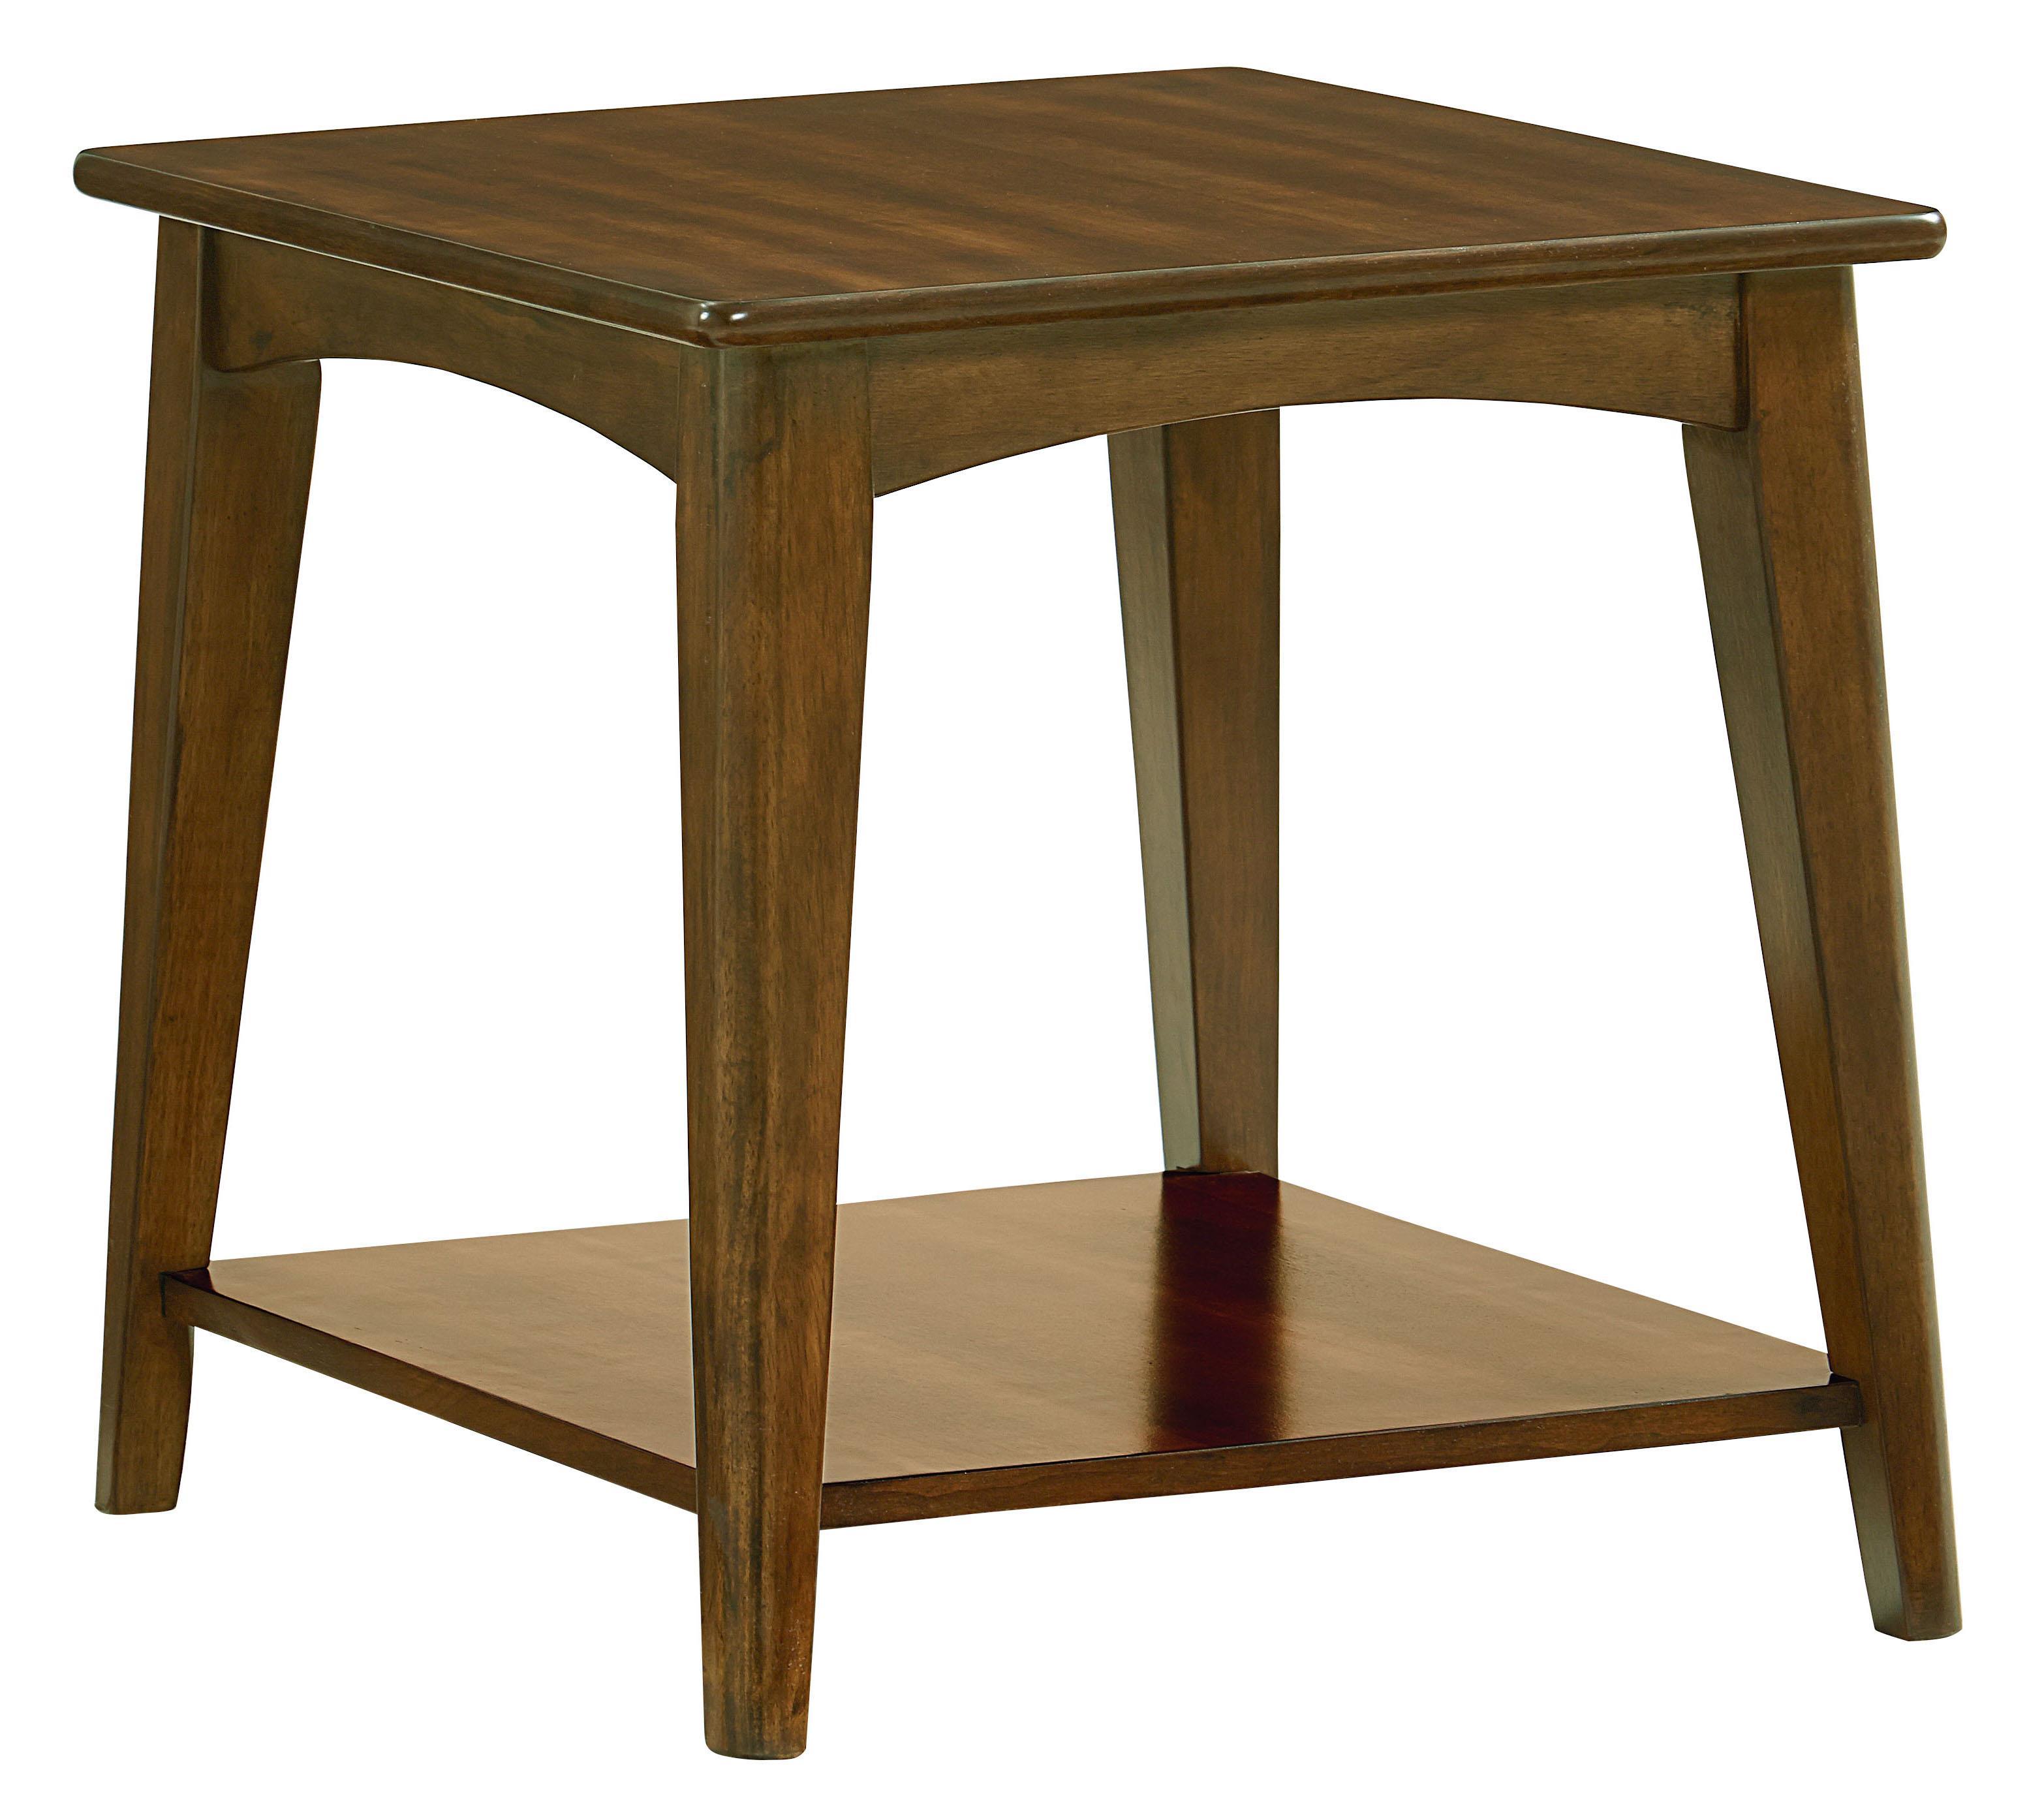 Standard Furniture Roxbury Mid Century Modern End Table With Splayed Legs